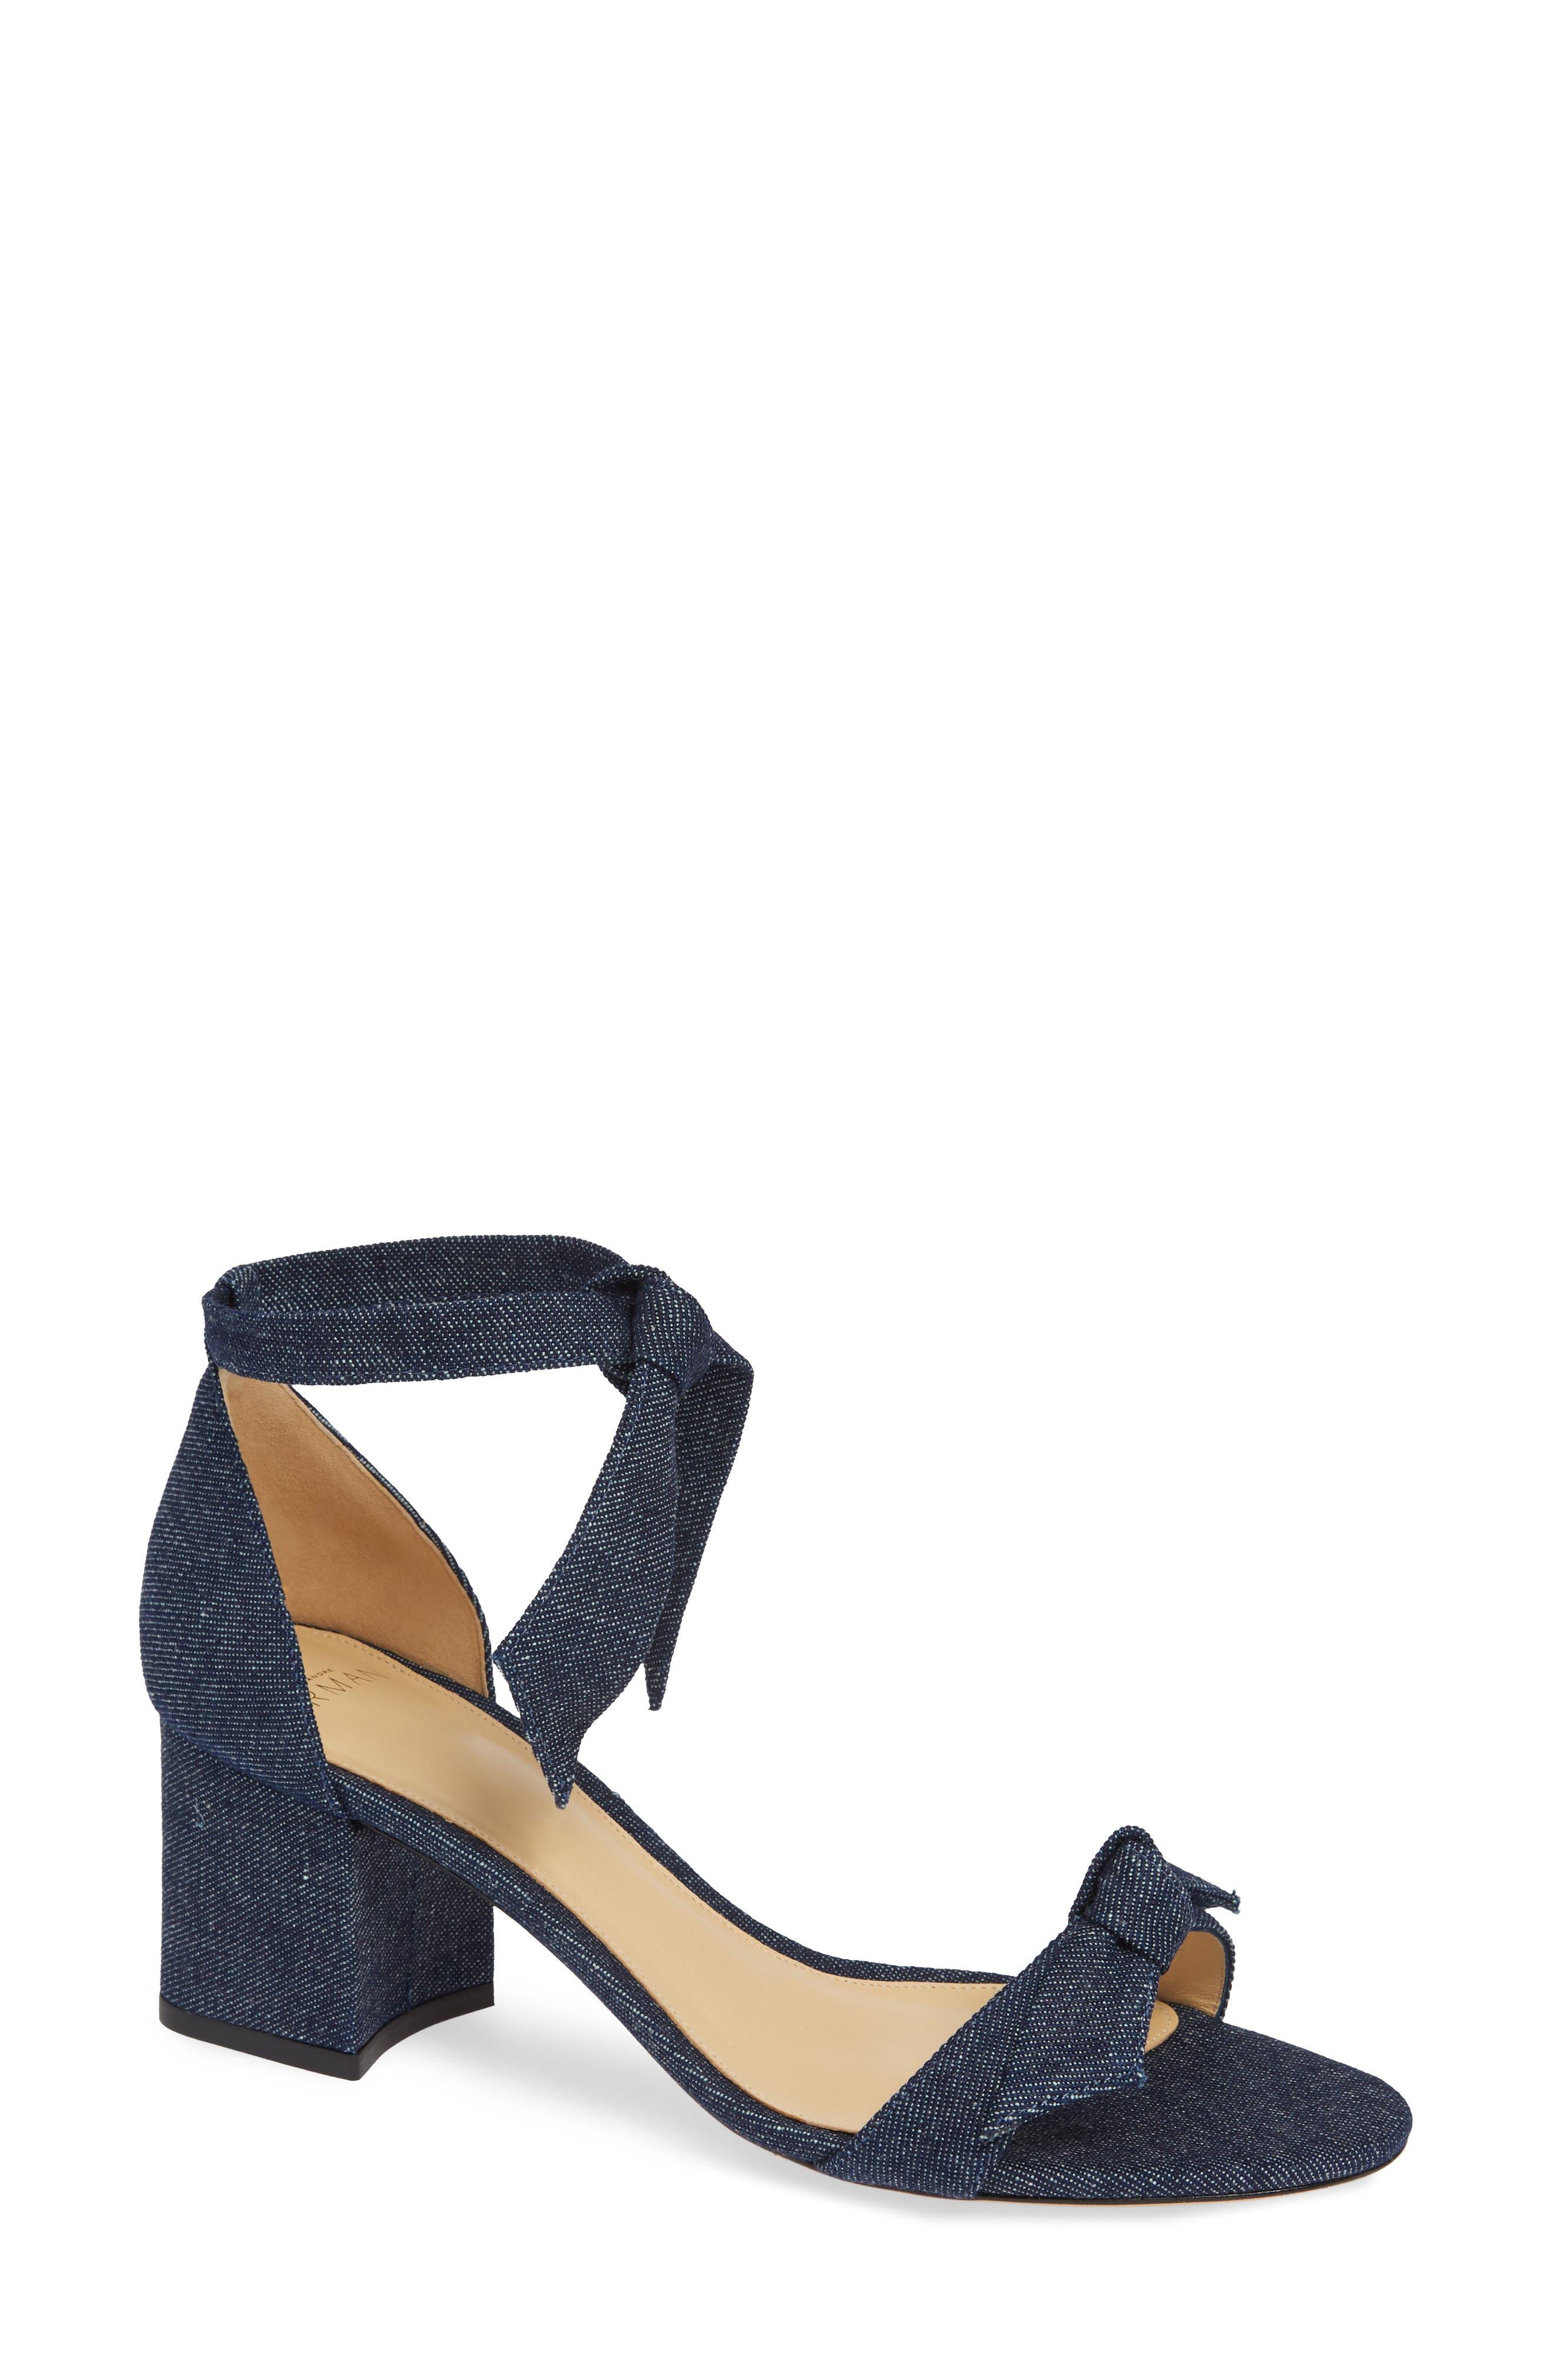 Alexandre Birman Clarita Block Heel Sandal, Blue